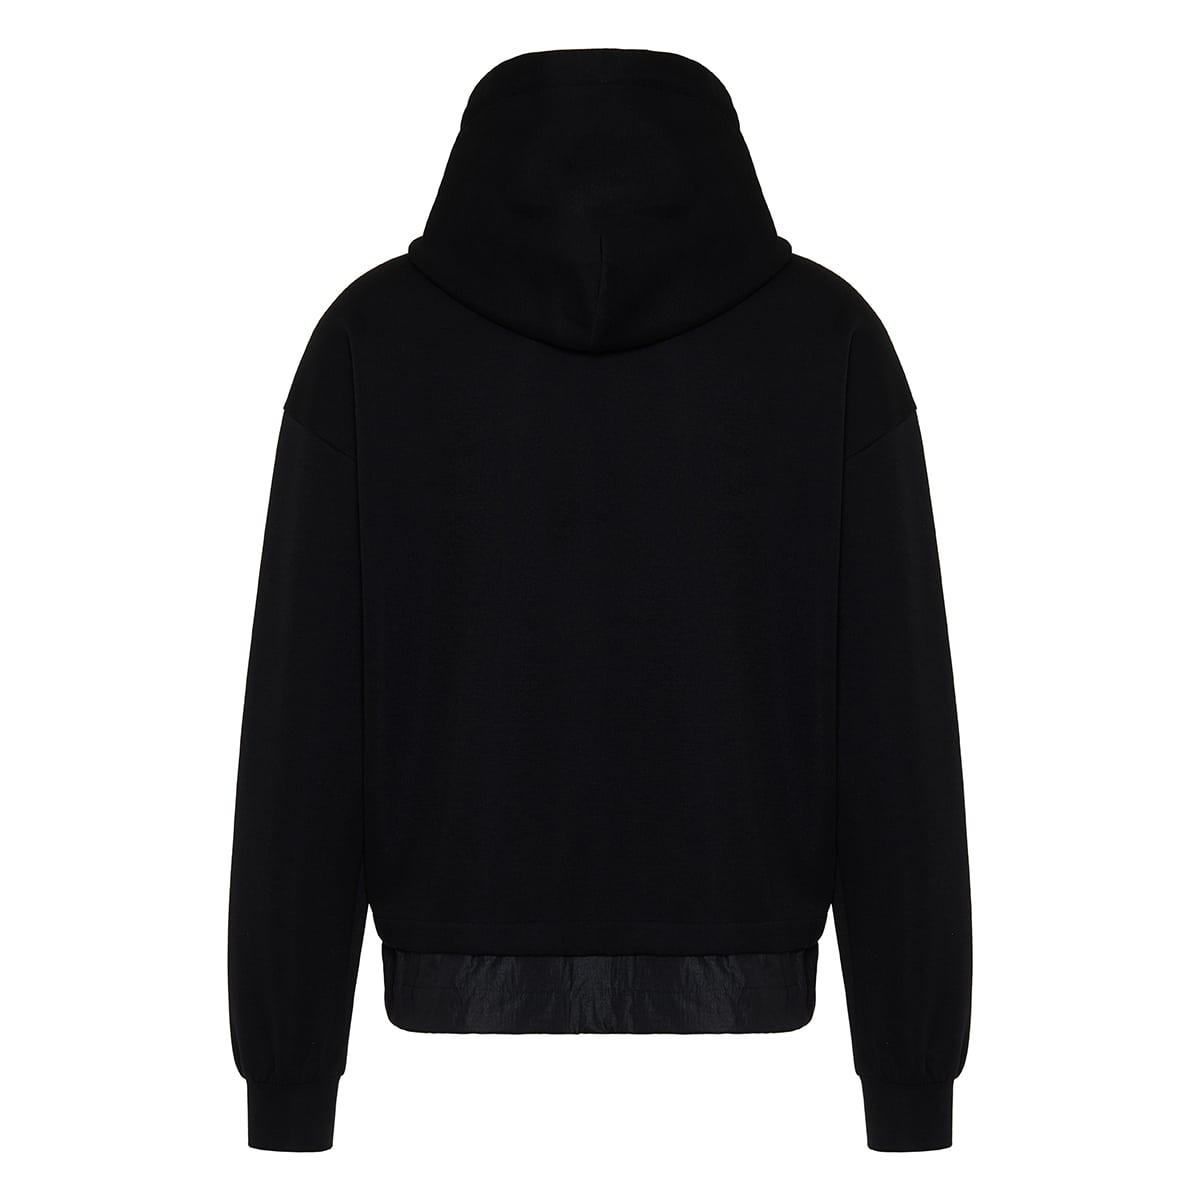 DG nylon-trimmed cotton hoodie